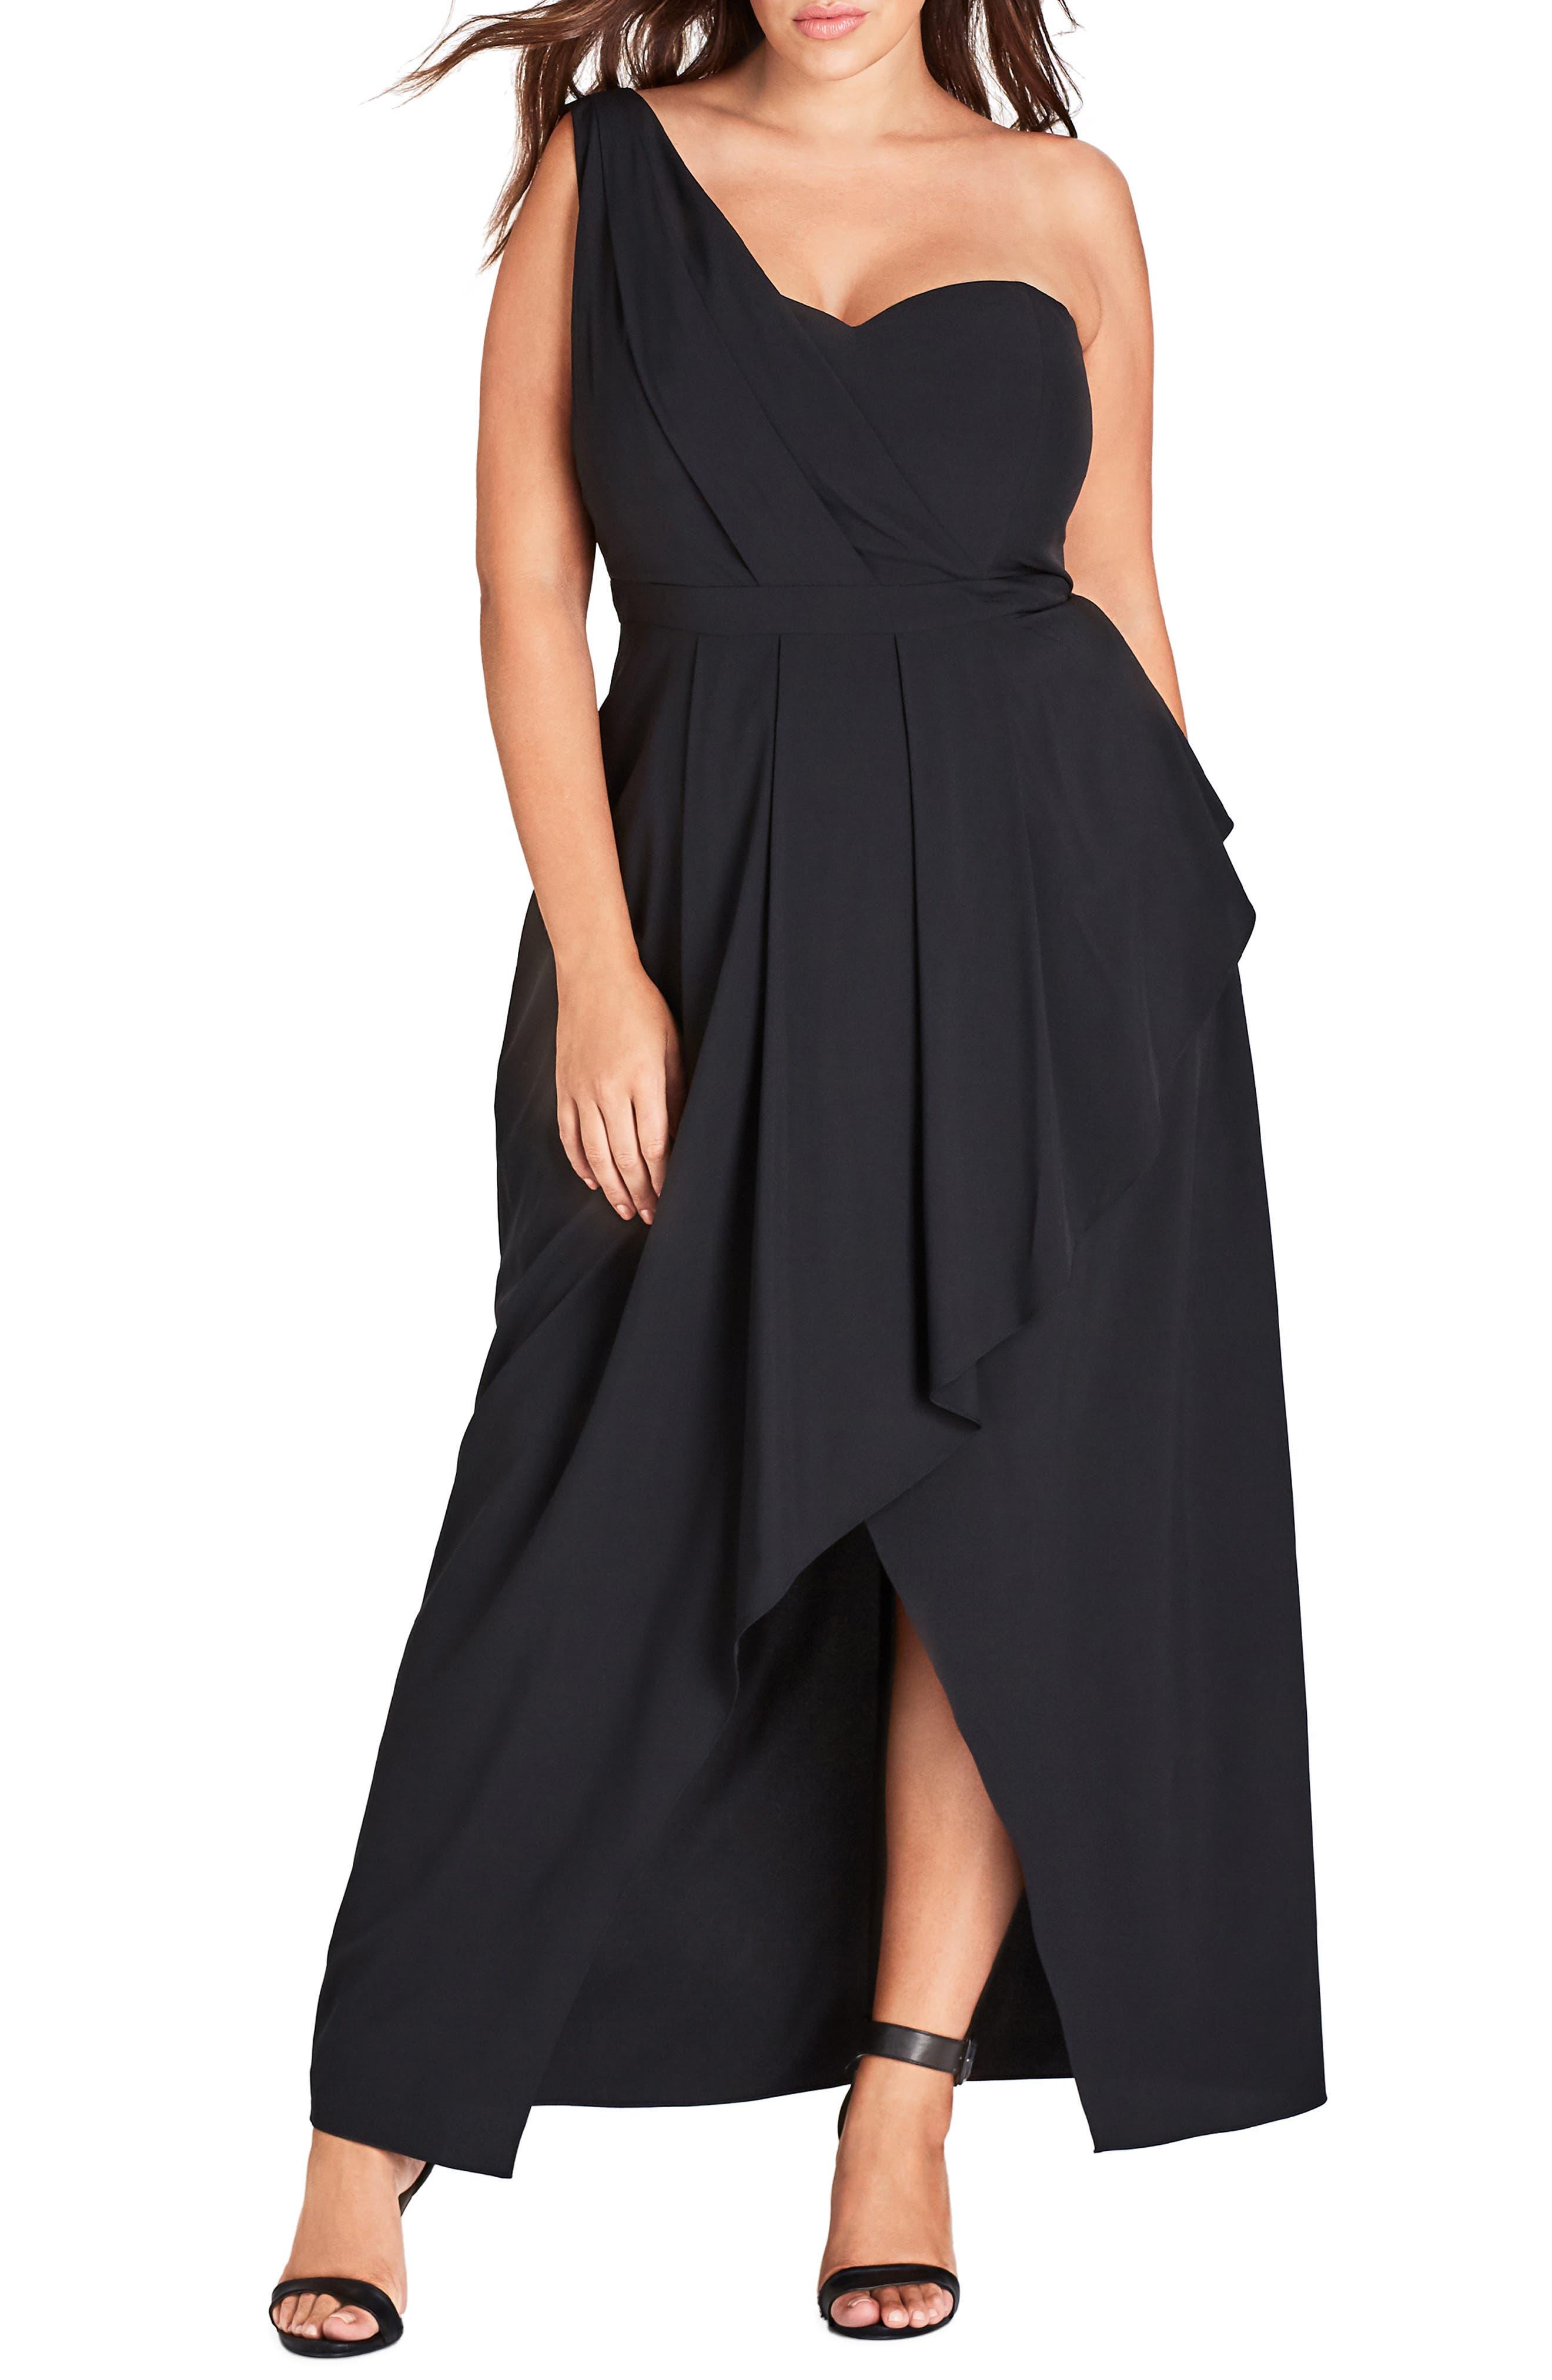 CITY CHIC, Allure One-Shoulder Maxi Dress, Main thumbnail 1, color, BLACK